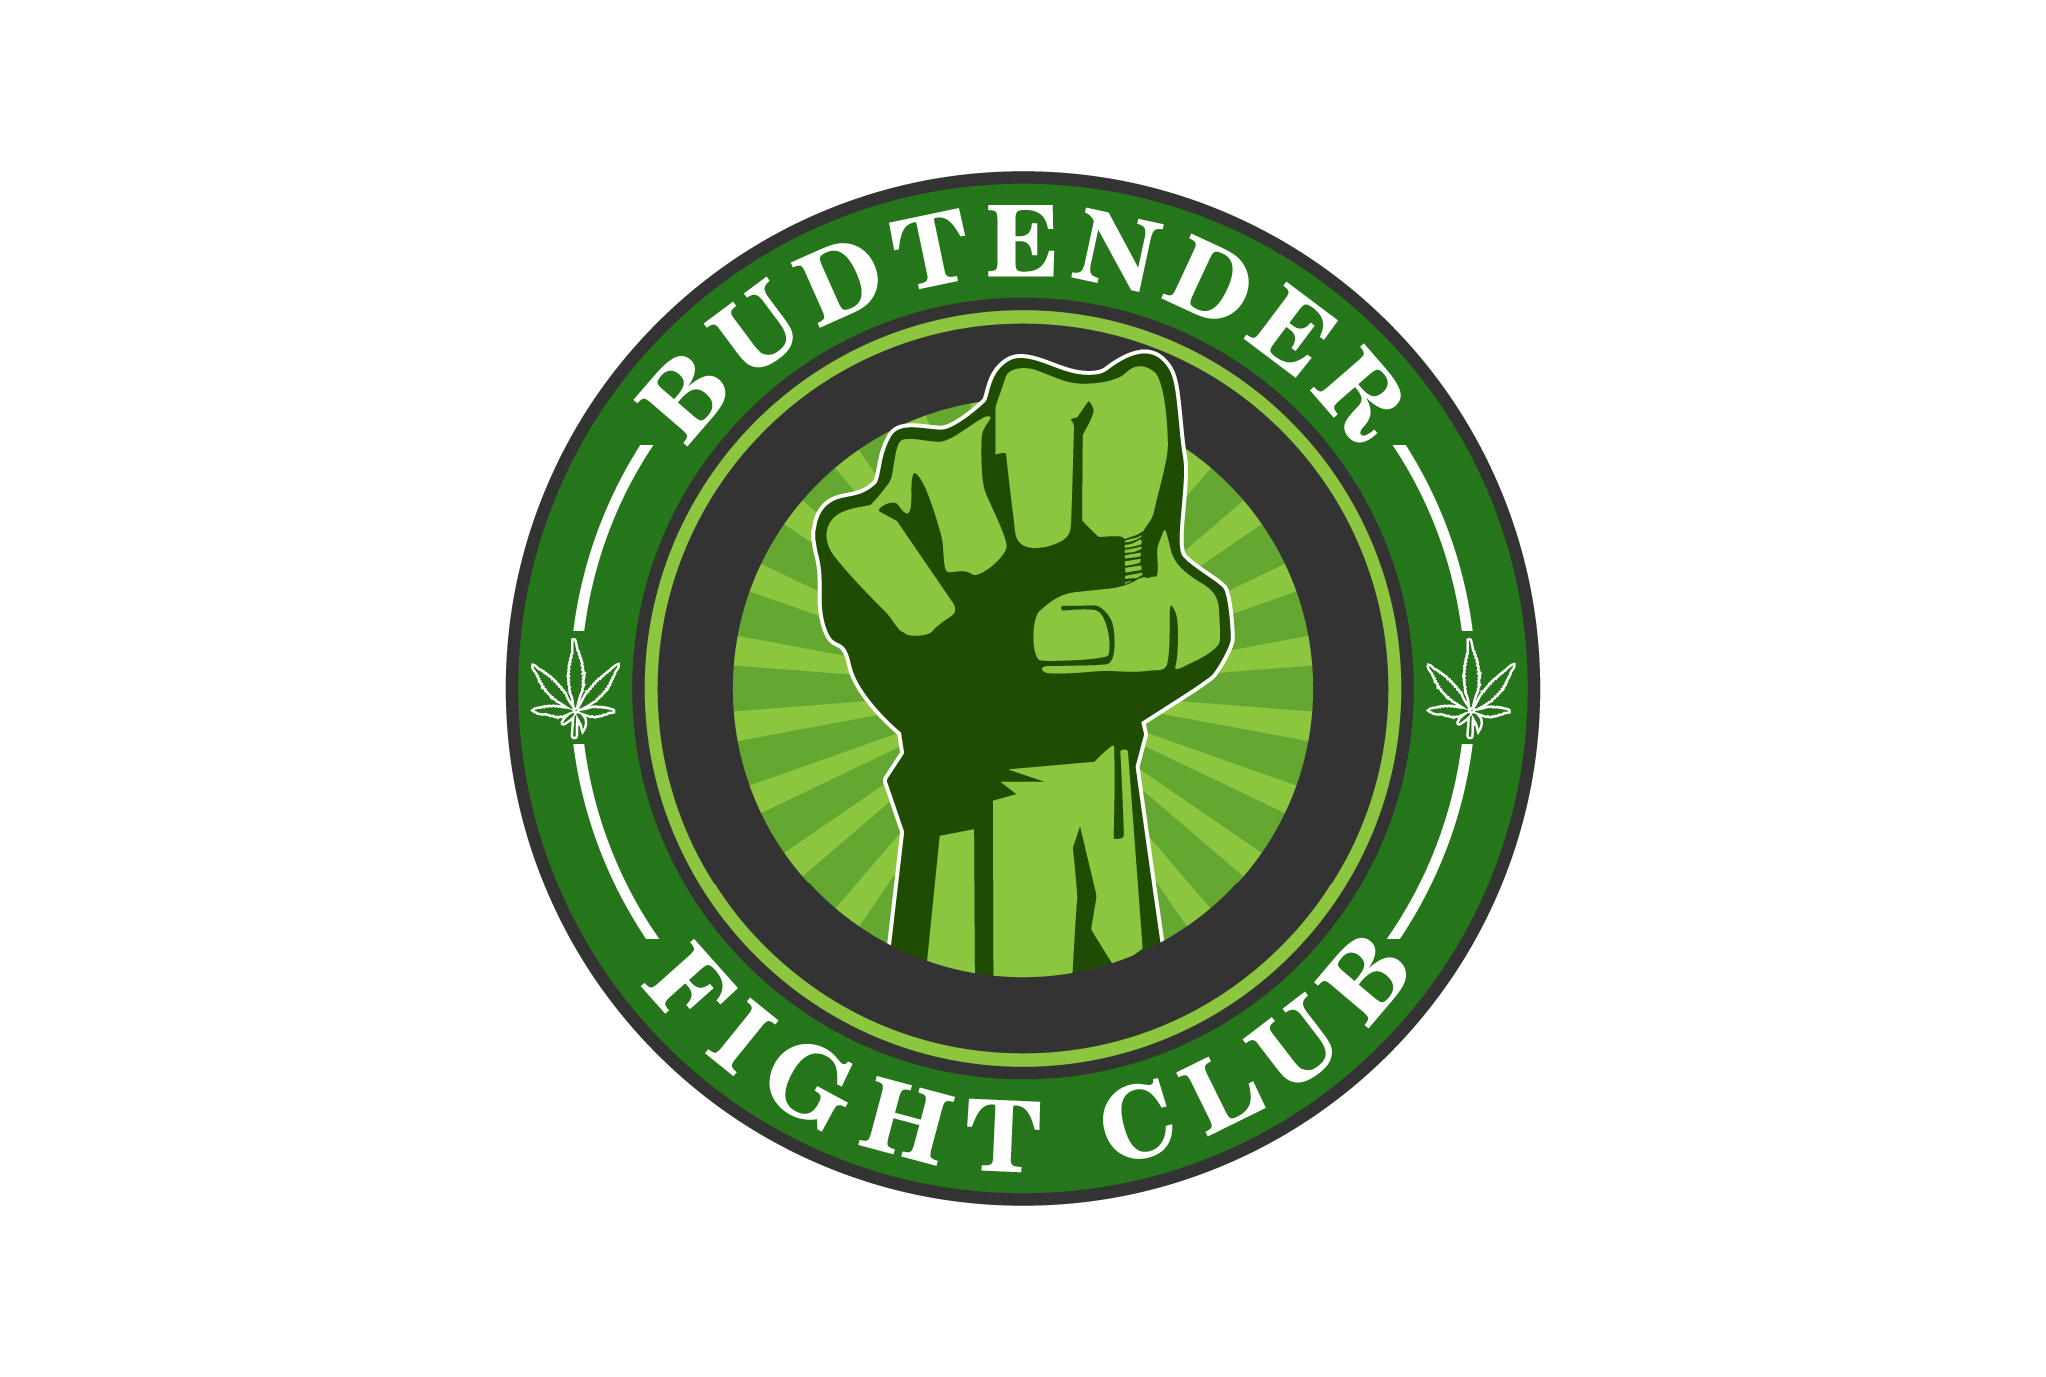 budtenderfightclub2-1.jpg